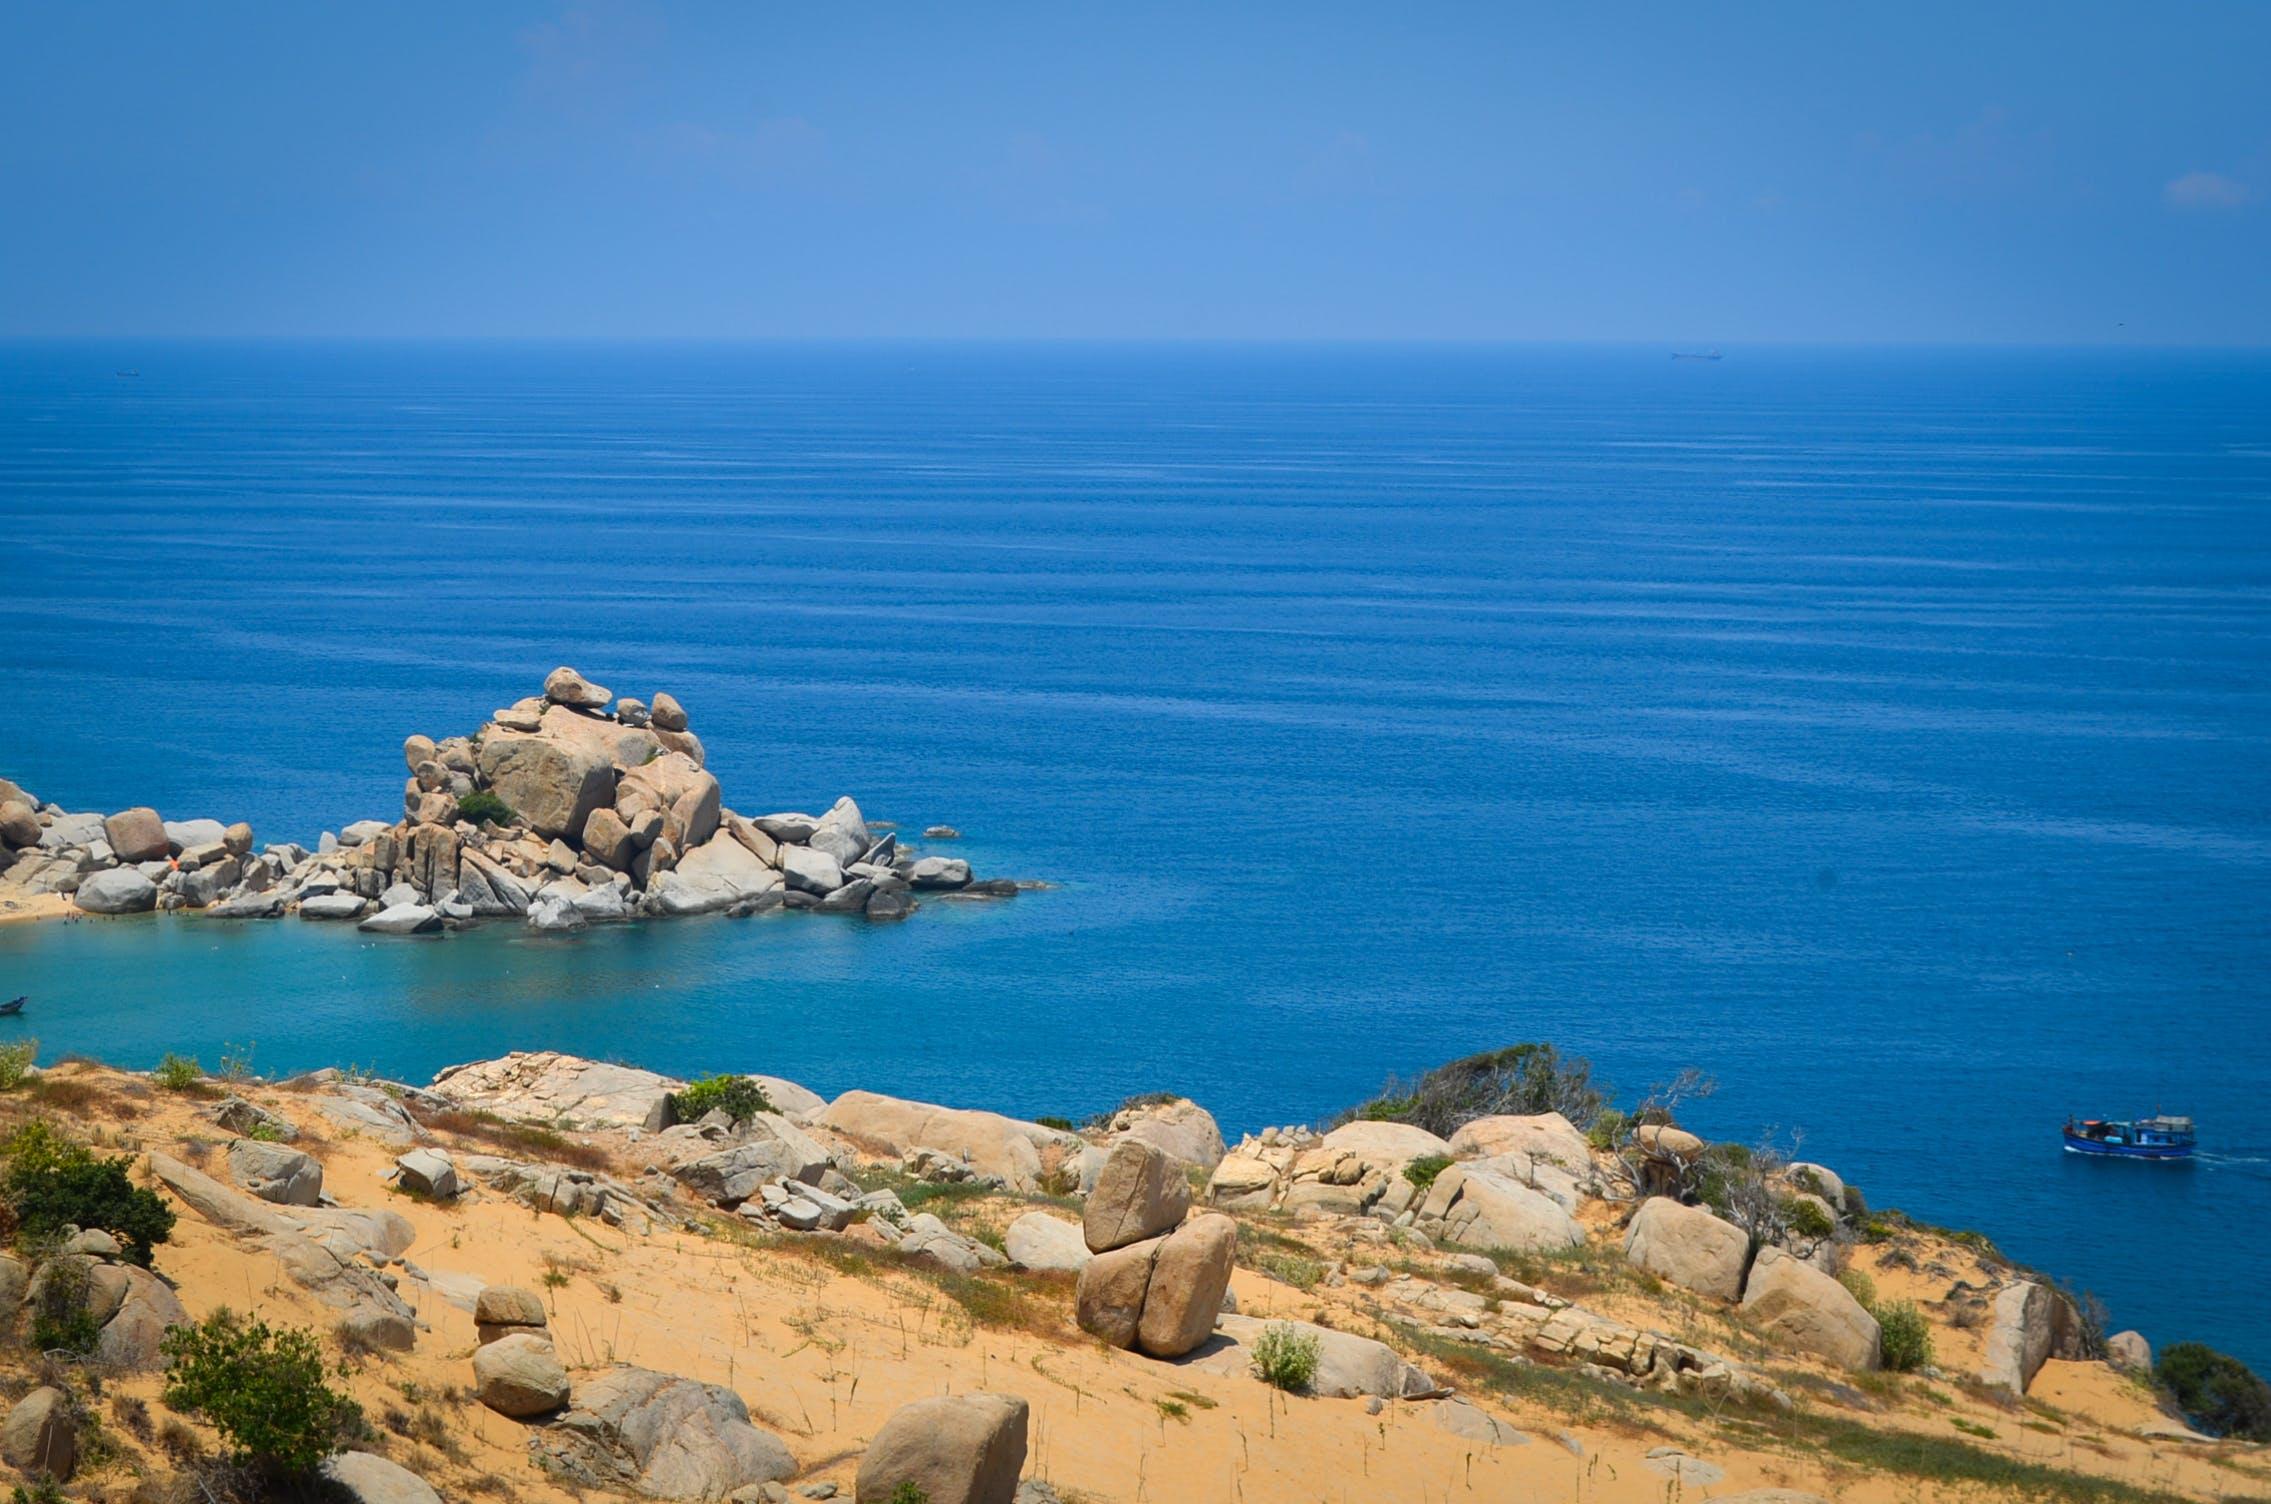 Free stock photo of sea, rocky